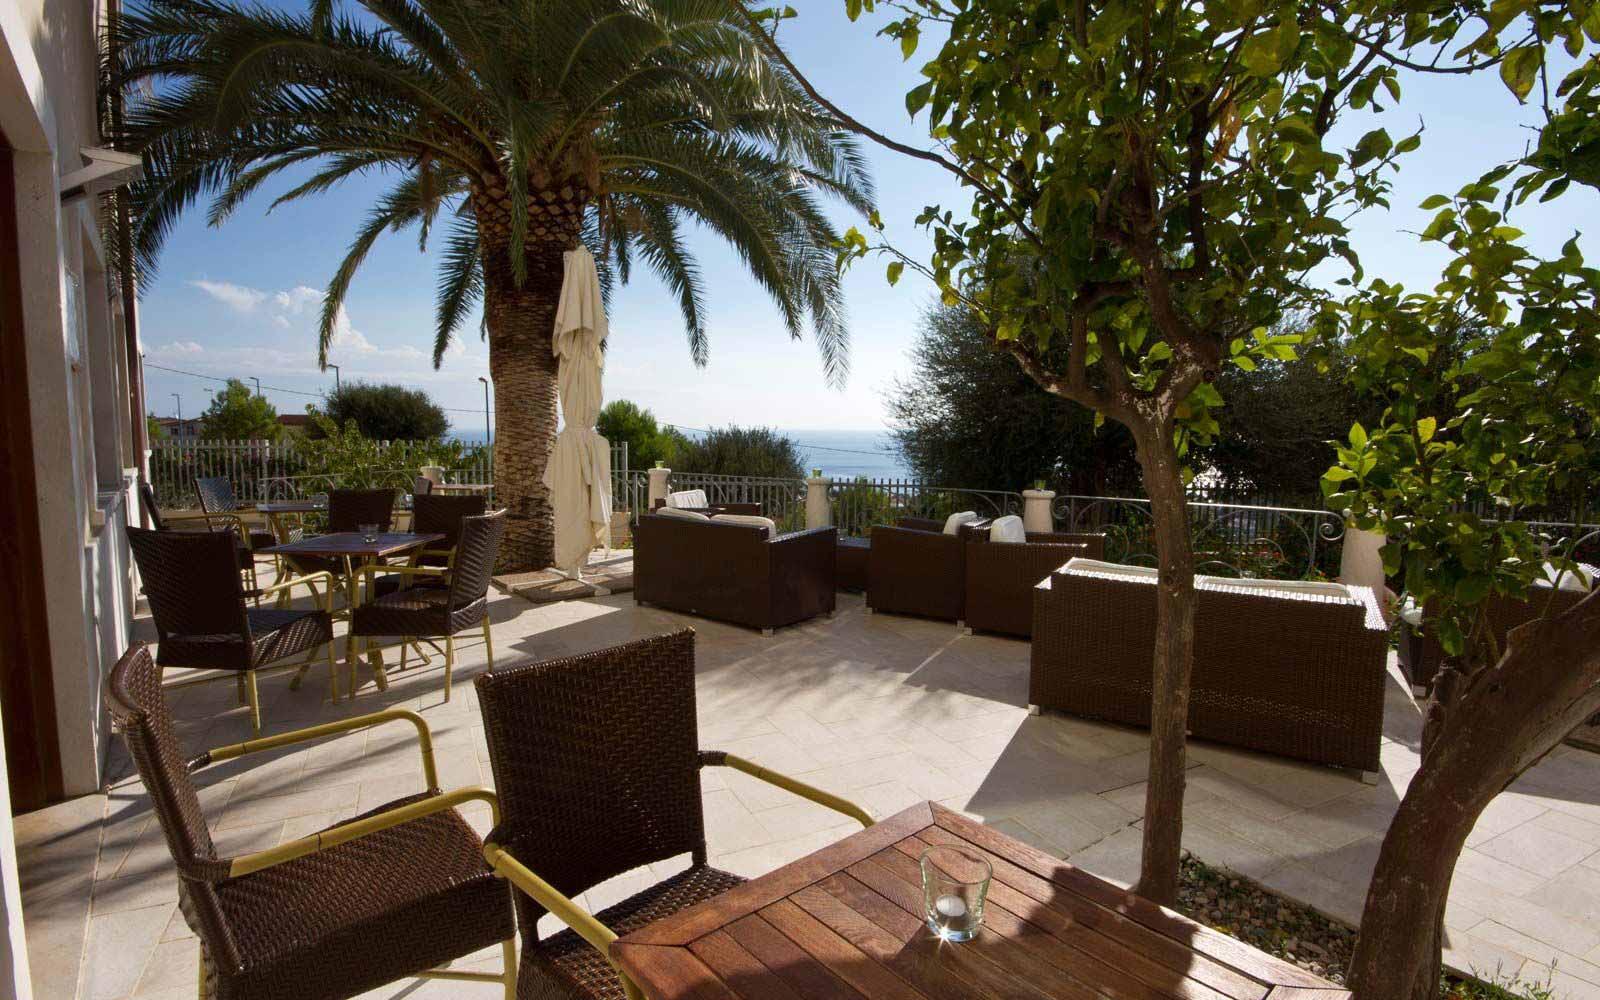 Sun terrace at Hotel Brancamaria